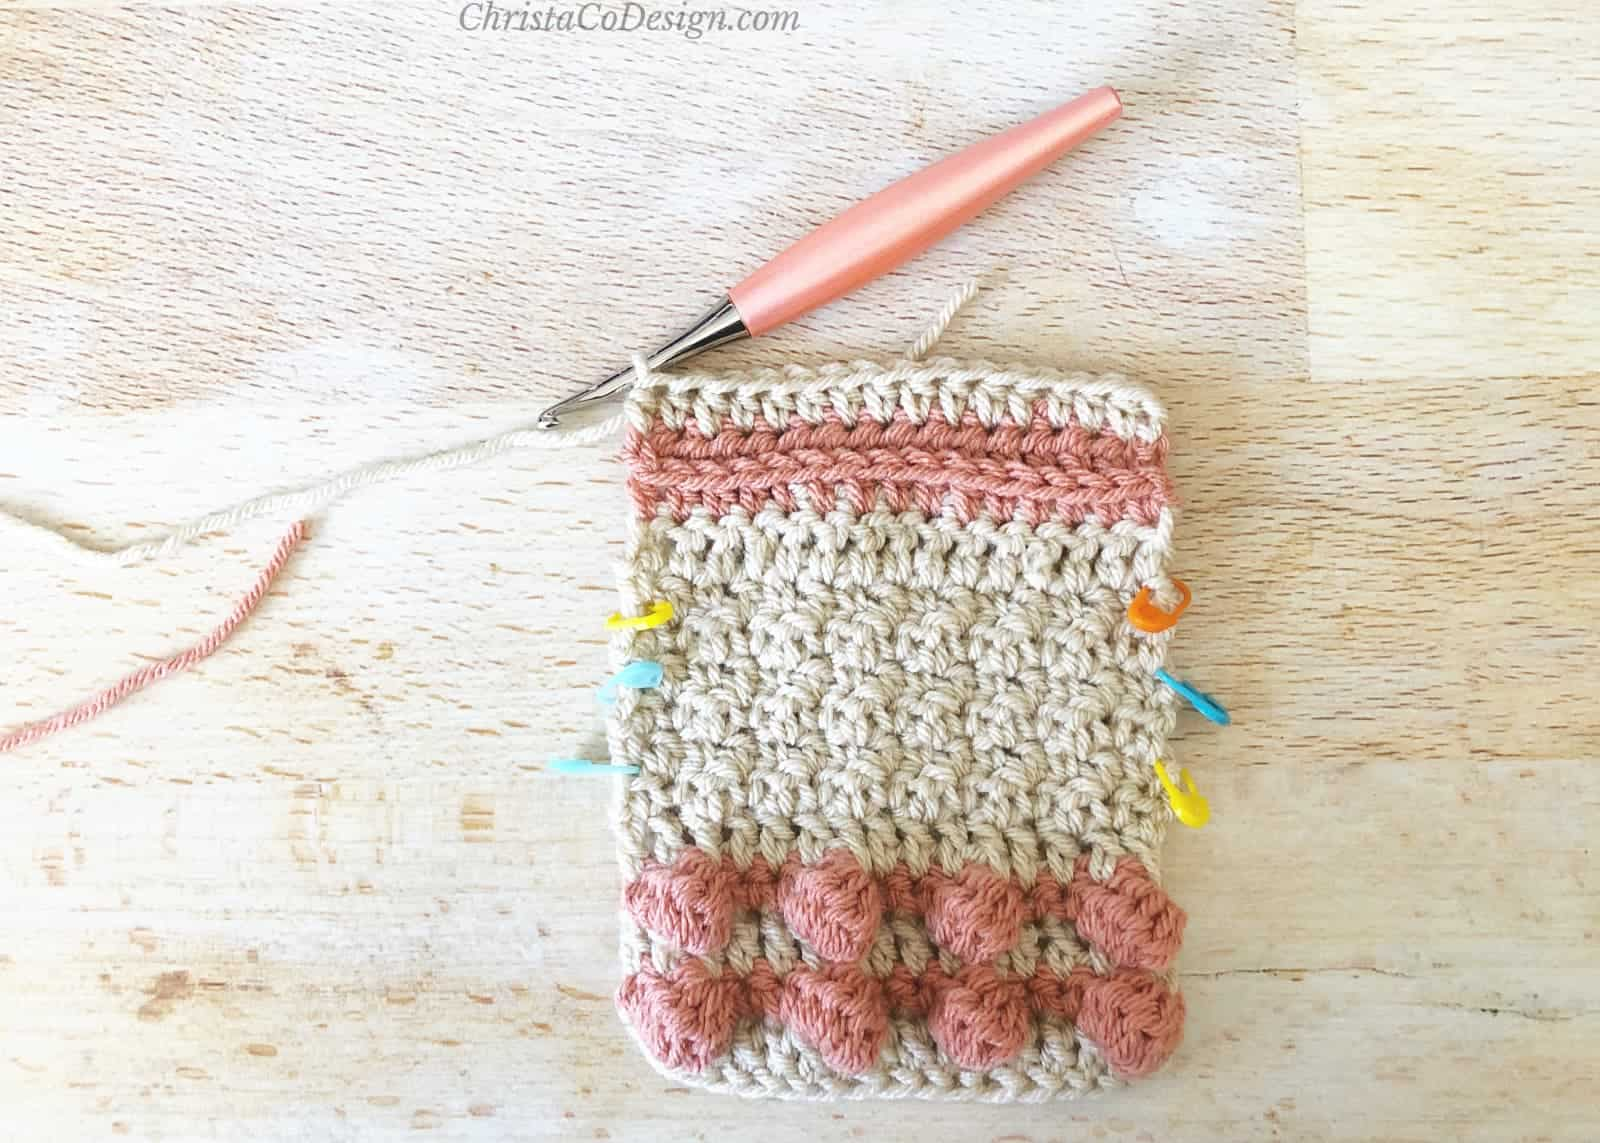 3rd loop ridge below half double crochet stitches.